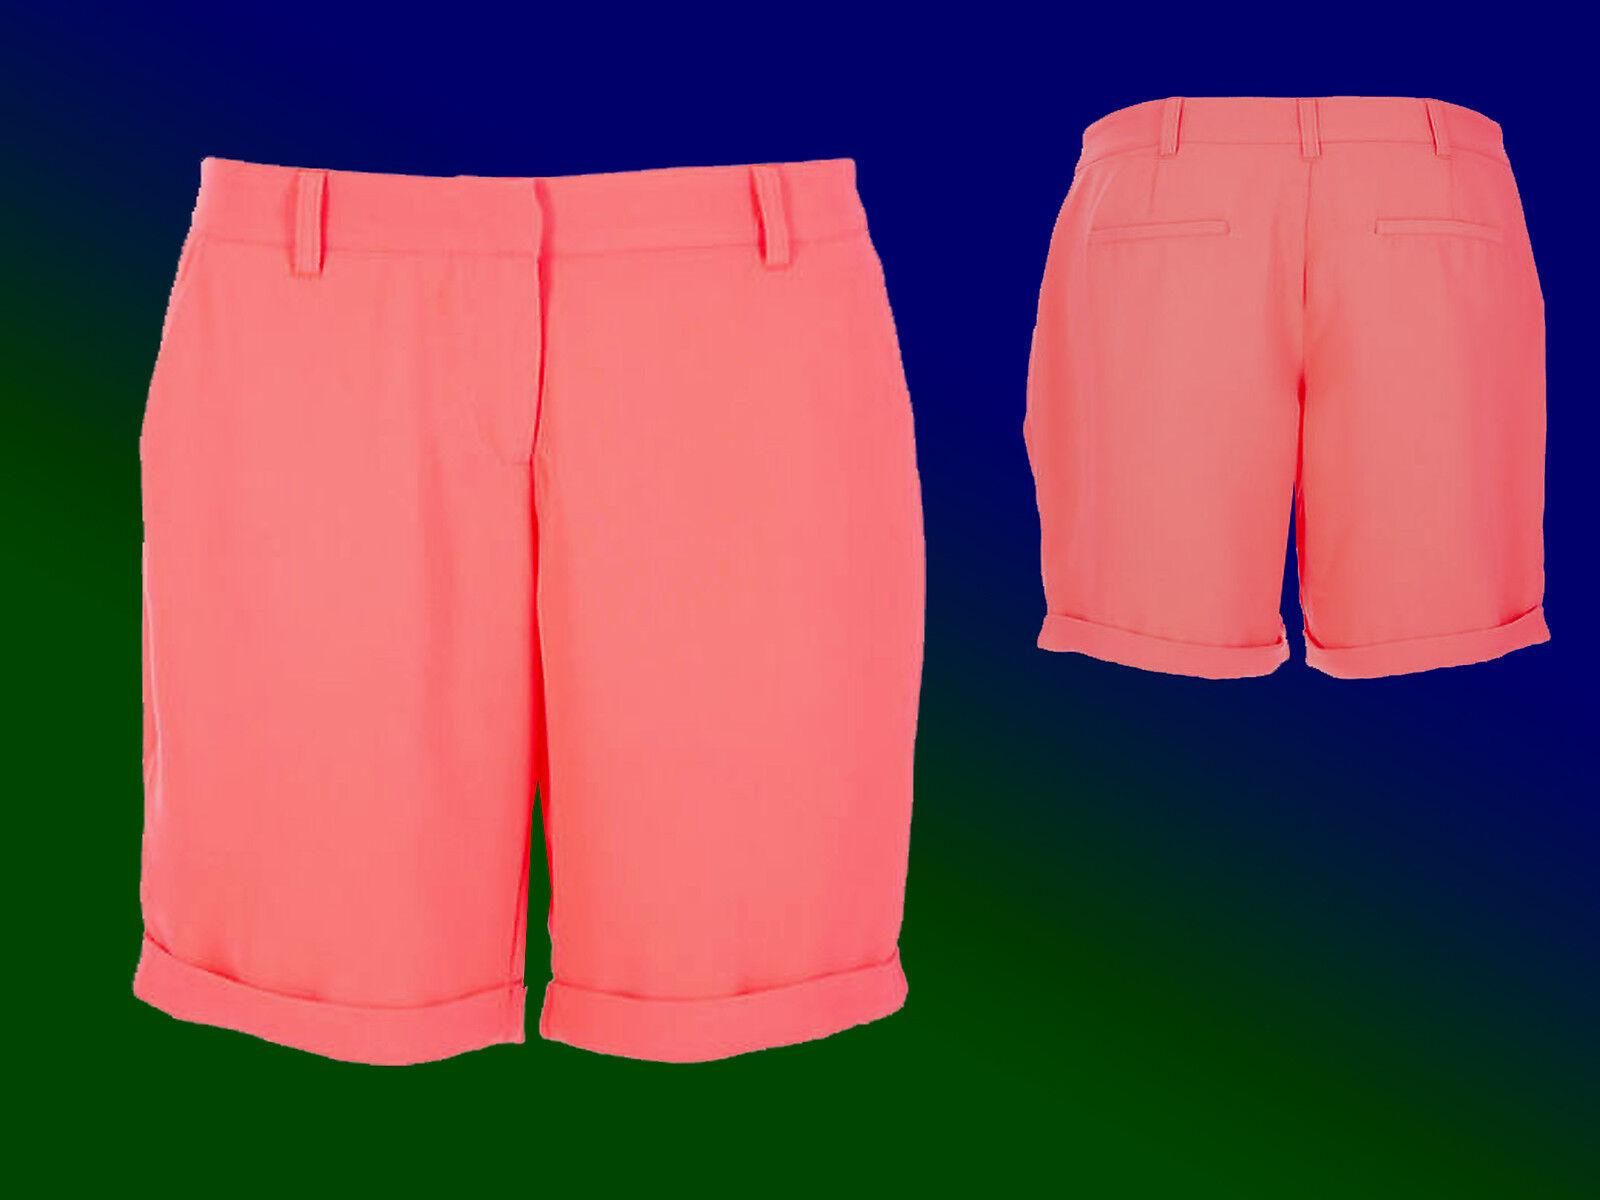 elegante Damenshorts Bermuda kurze Hose Sommerhose lachsfarben Gr. 34 XS NEU